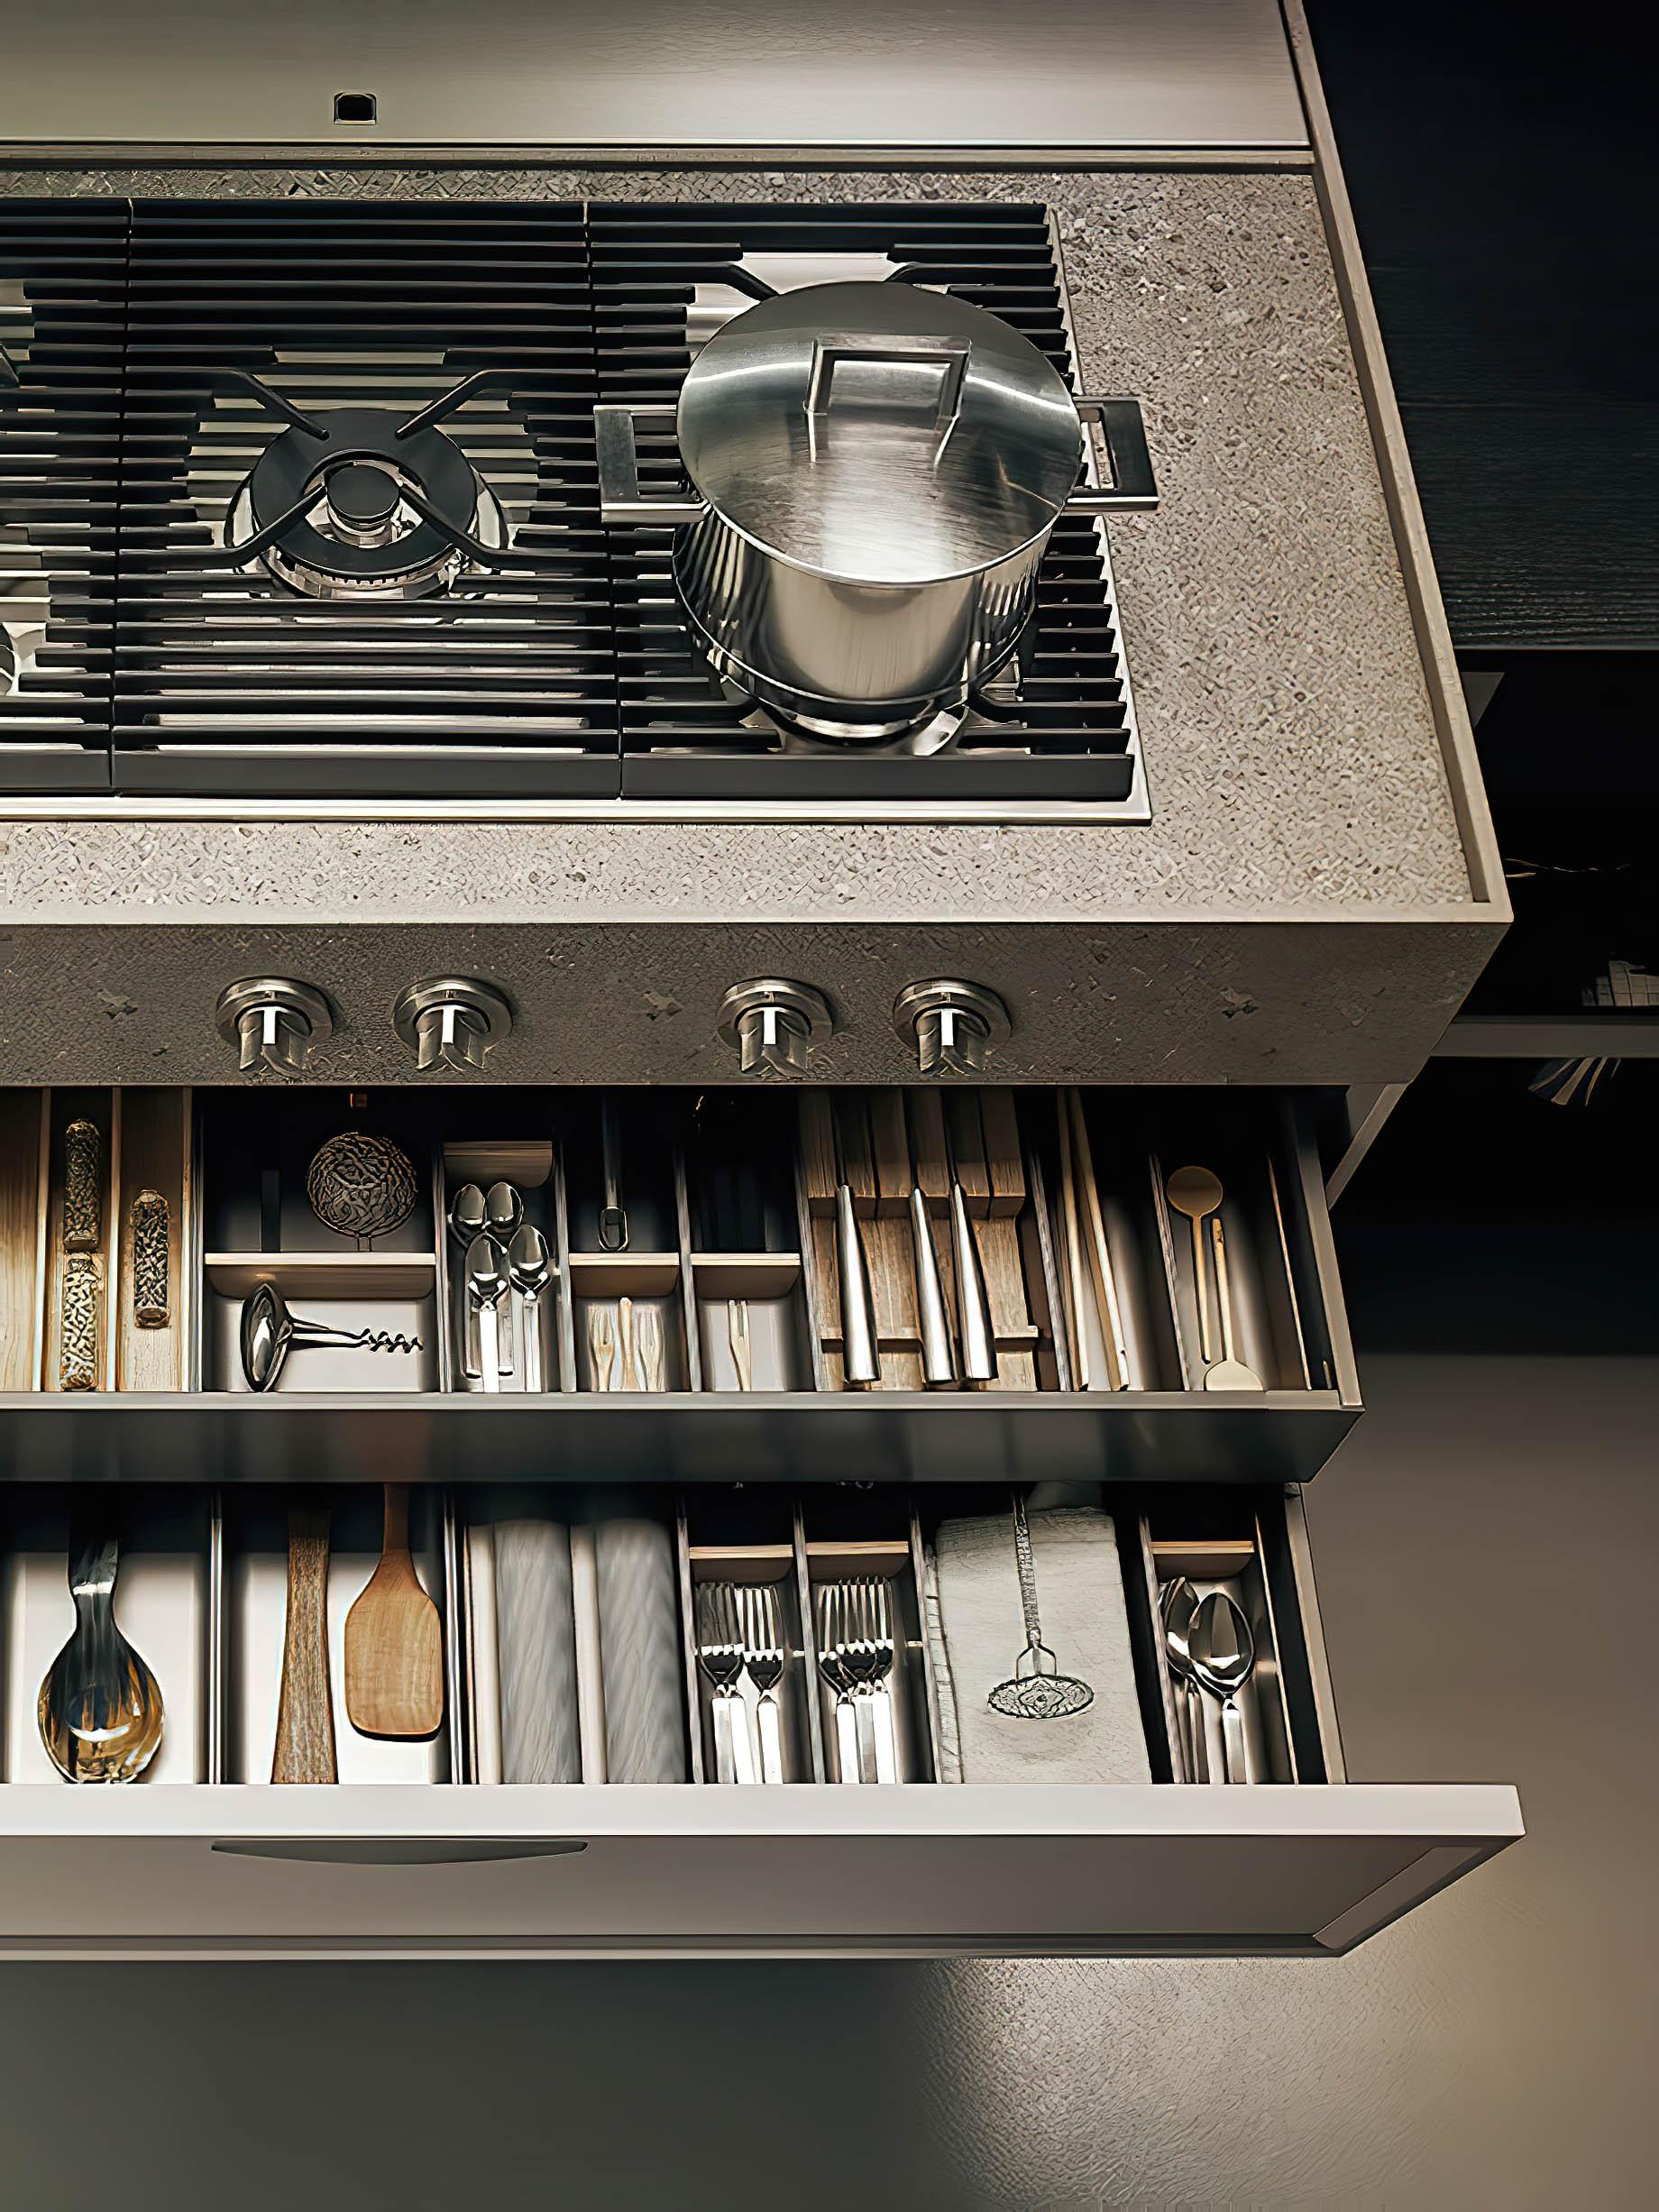 K-lab Contemporary Kitchen Ernestomeda Italy – Giuseppe Bavuso – Surf System